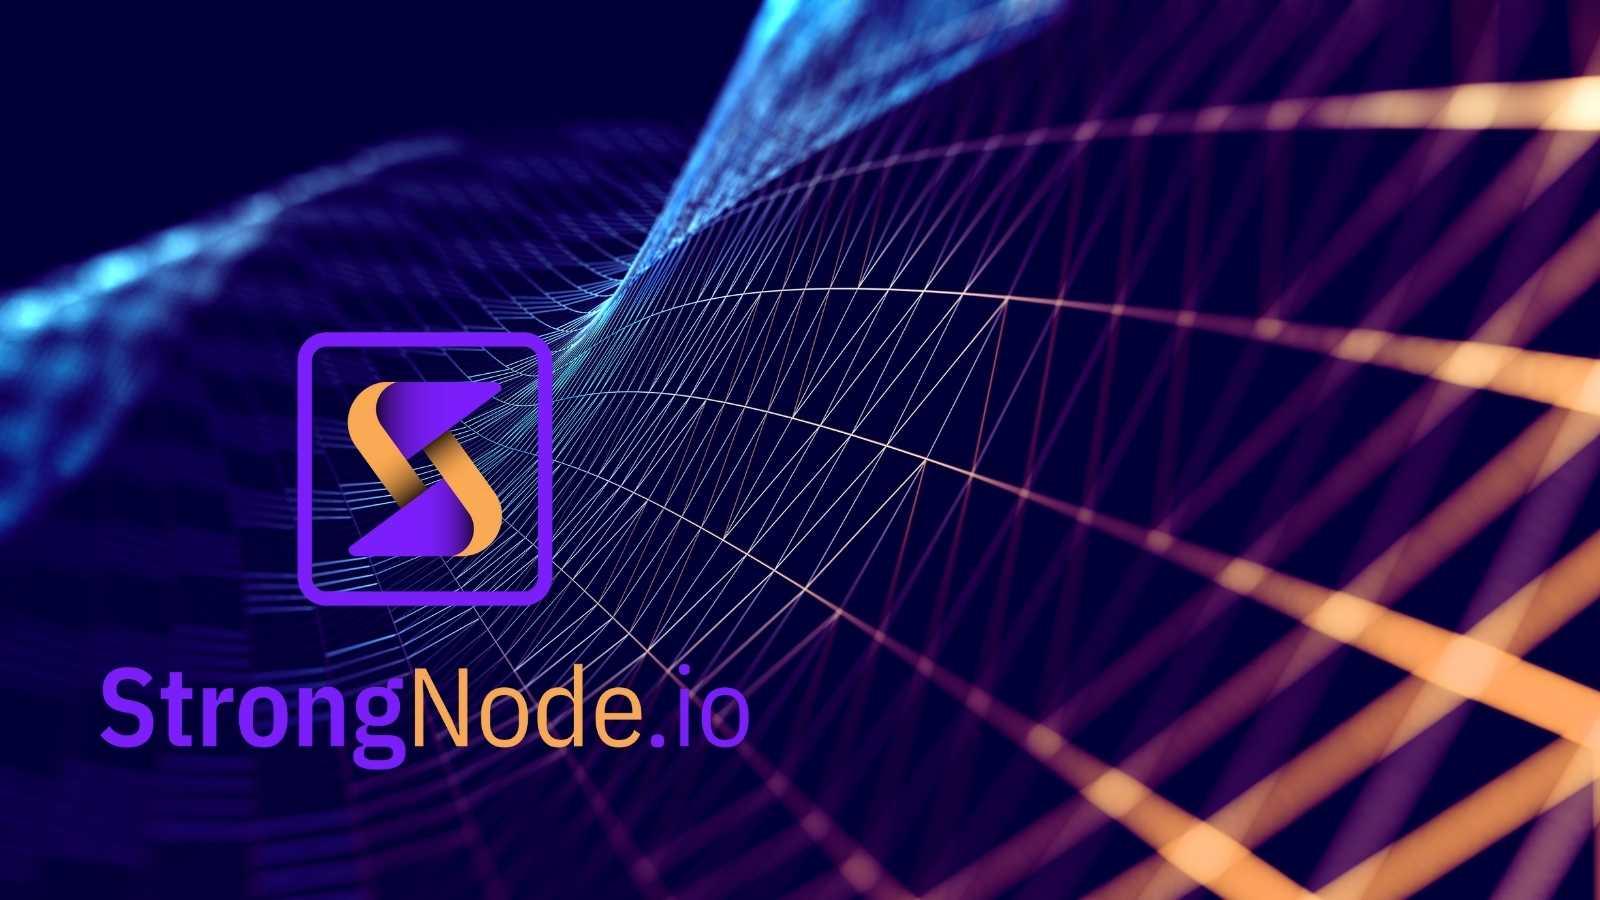 StrongNode.io - The Future of Digital Connectivity